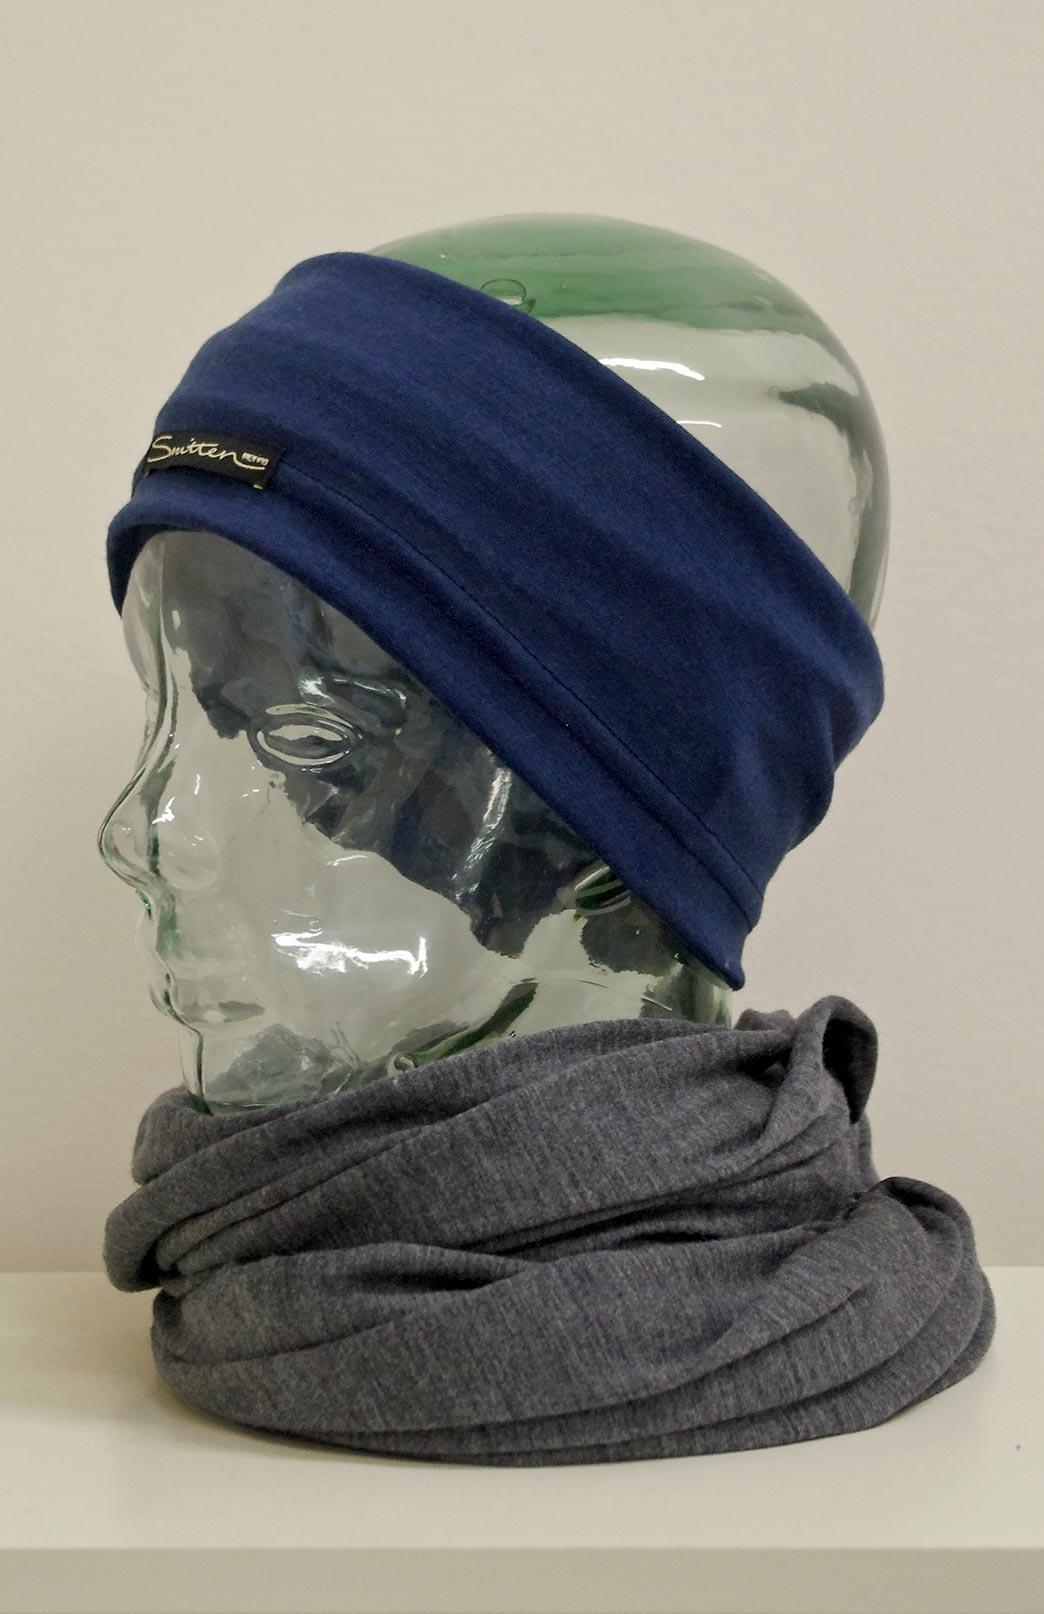 Headband / Ear Warmer - Unisex Indigo Blue Merino Wool Headband and Ear Warmer - Smitten Merino Tasmania Australia